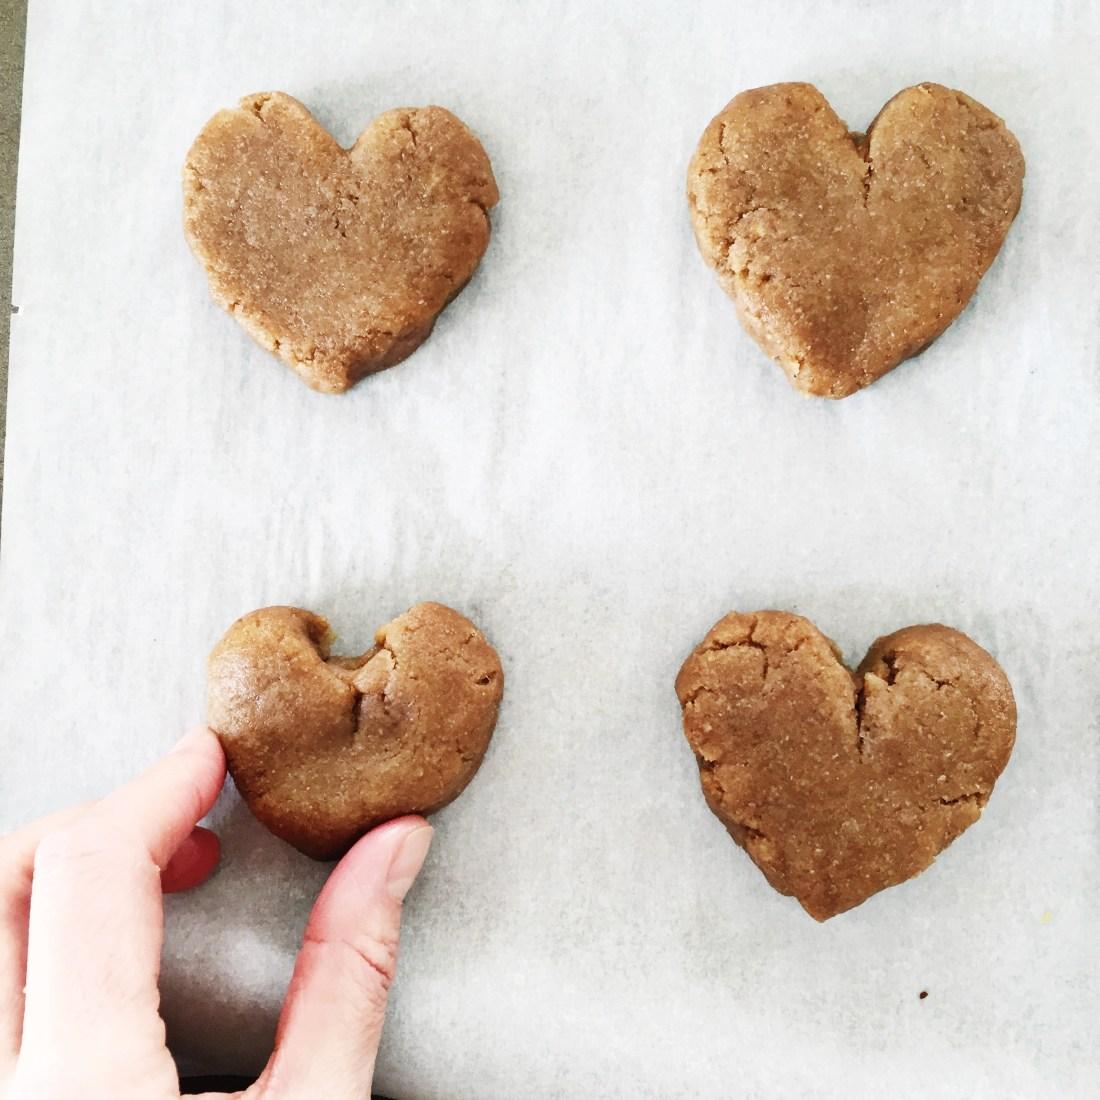 Peanut Butter Cookies Preparation